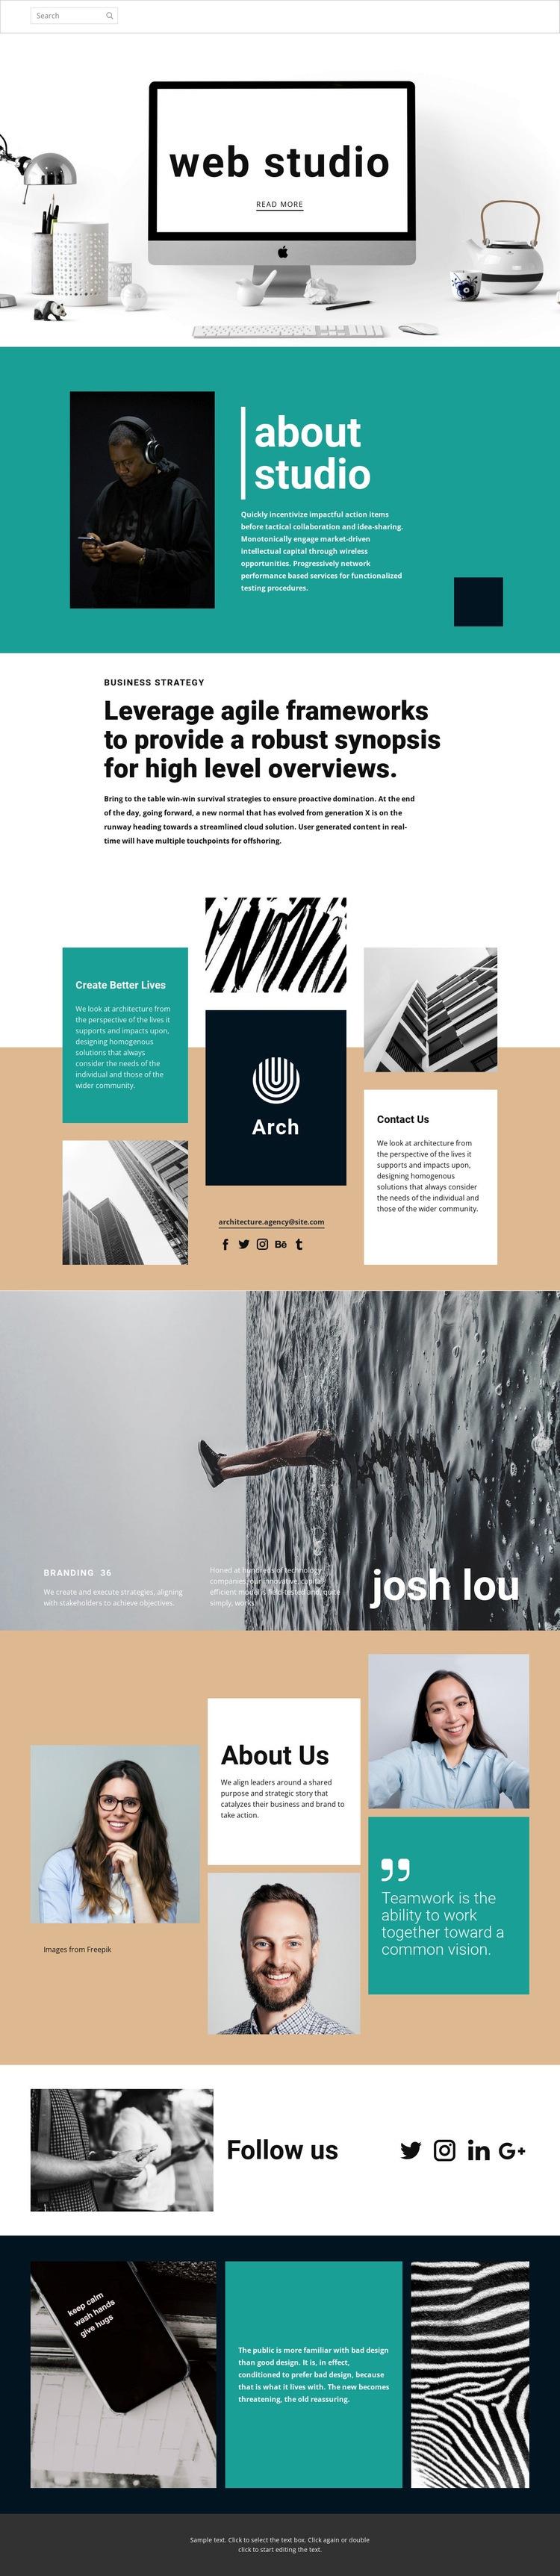 Web design studio of art Html Code Example